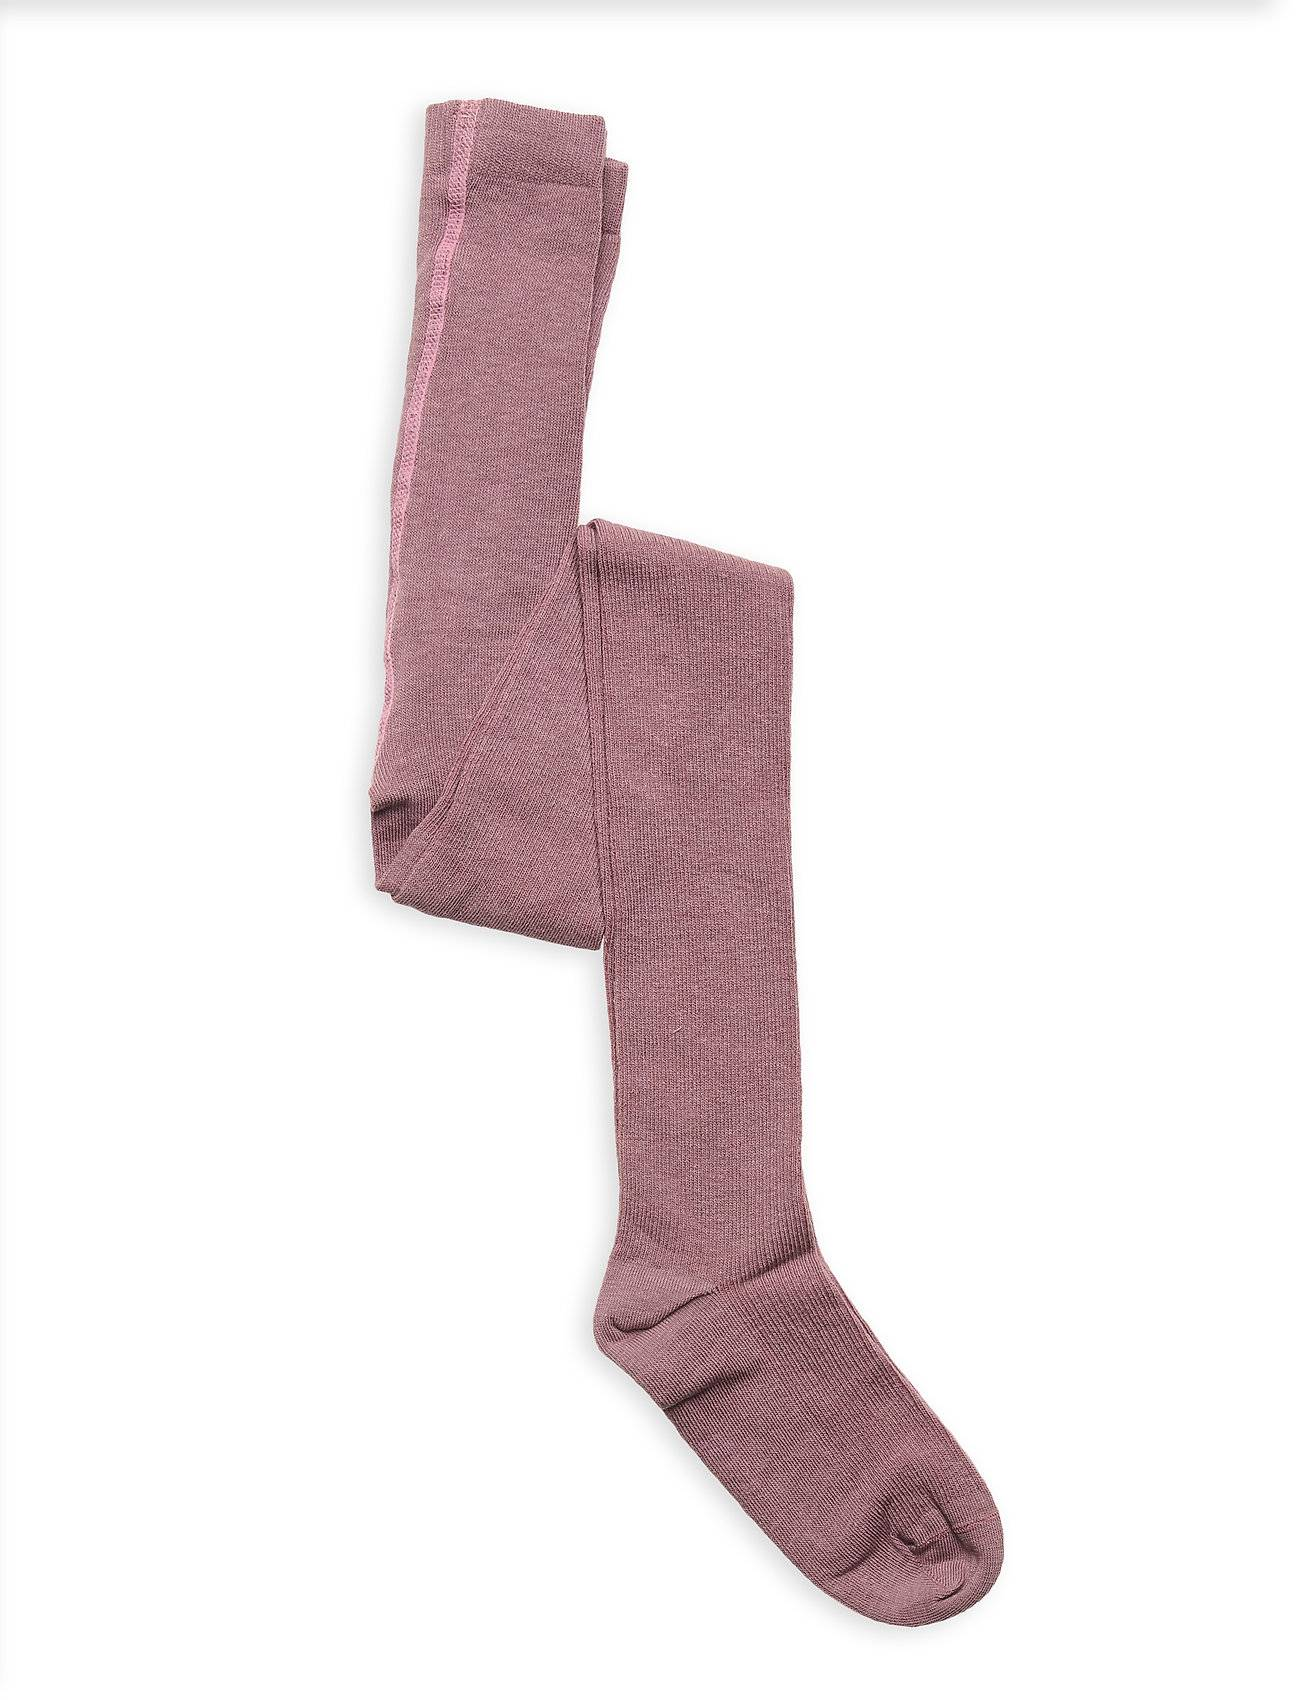 Creamie Stockings Sukkahousut Liila Creamie